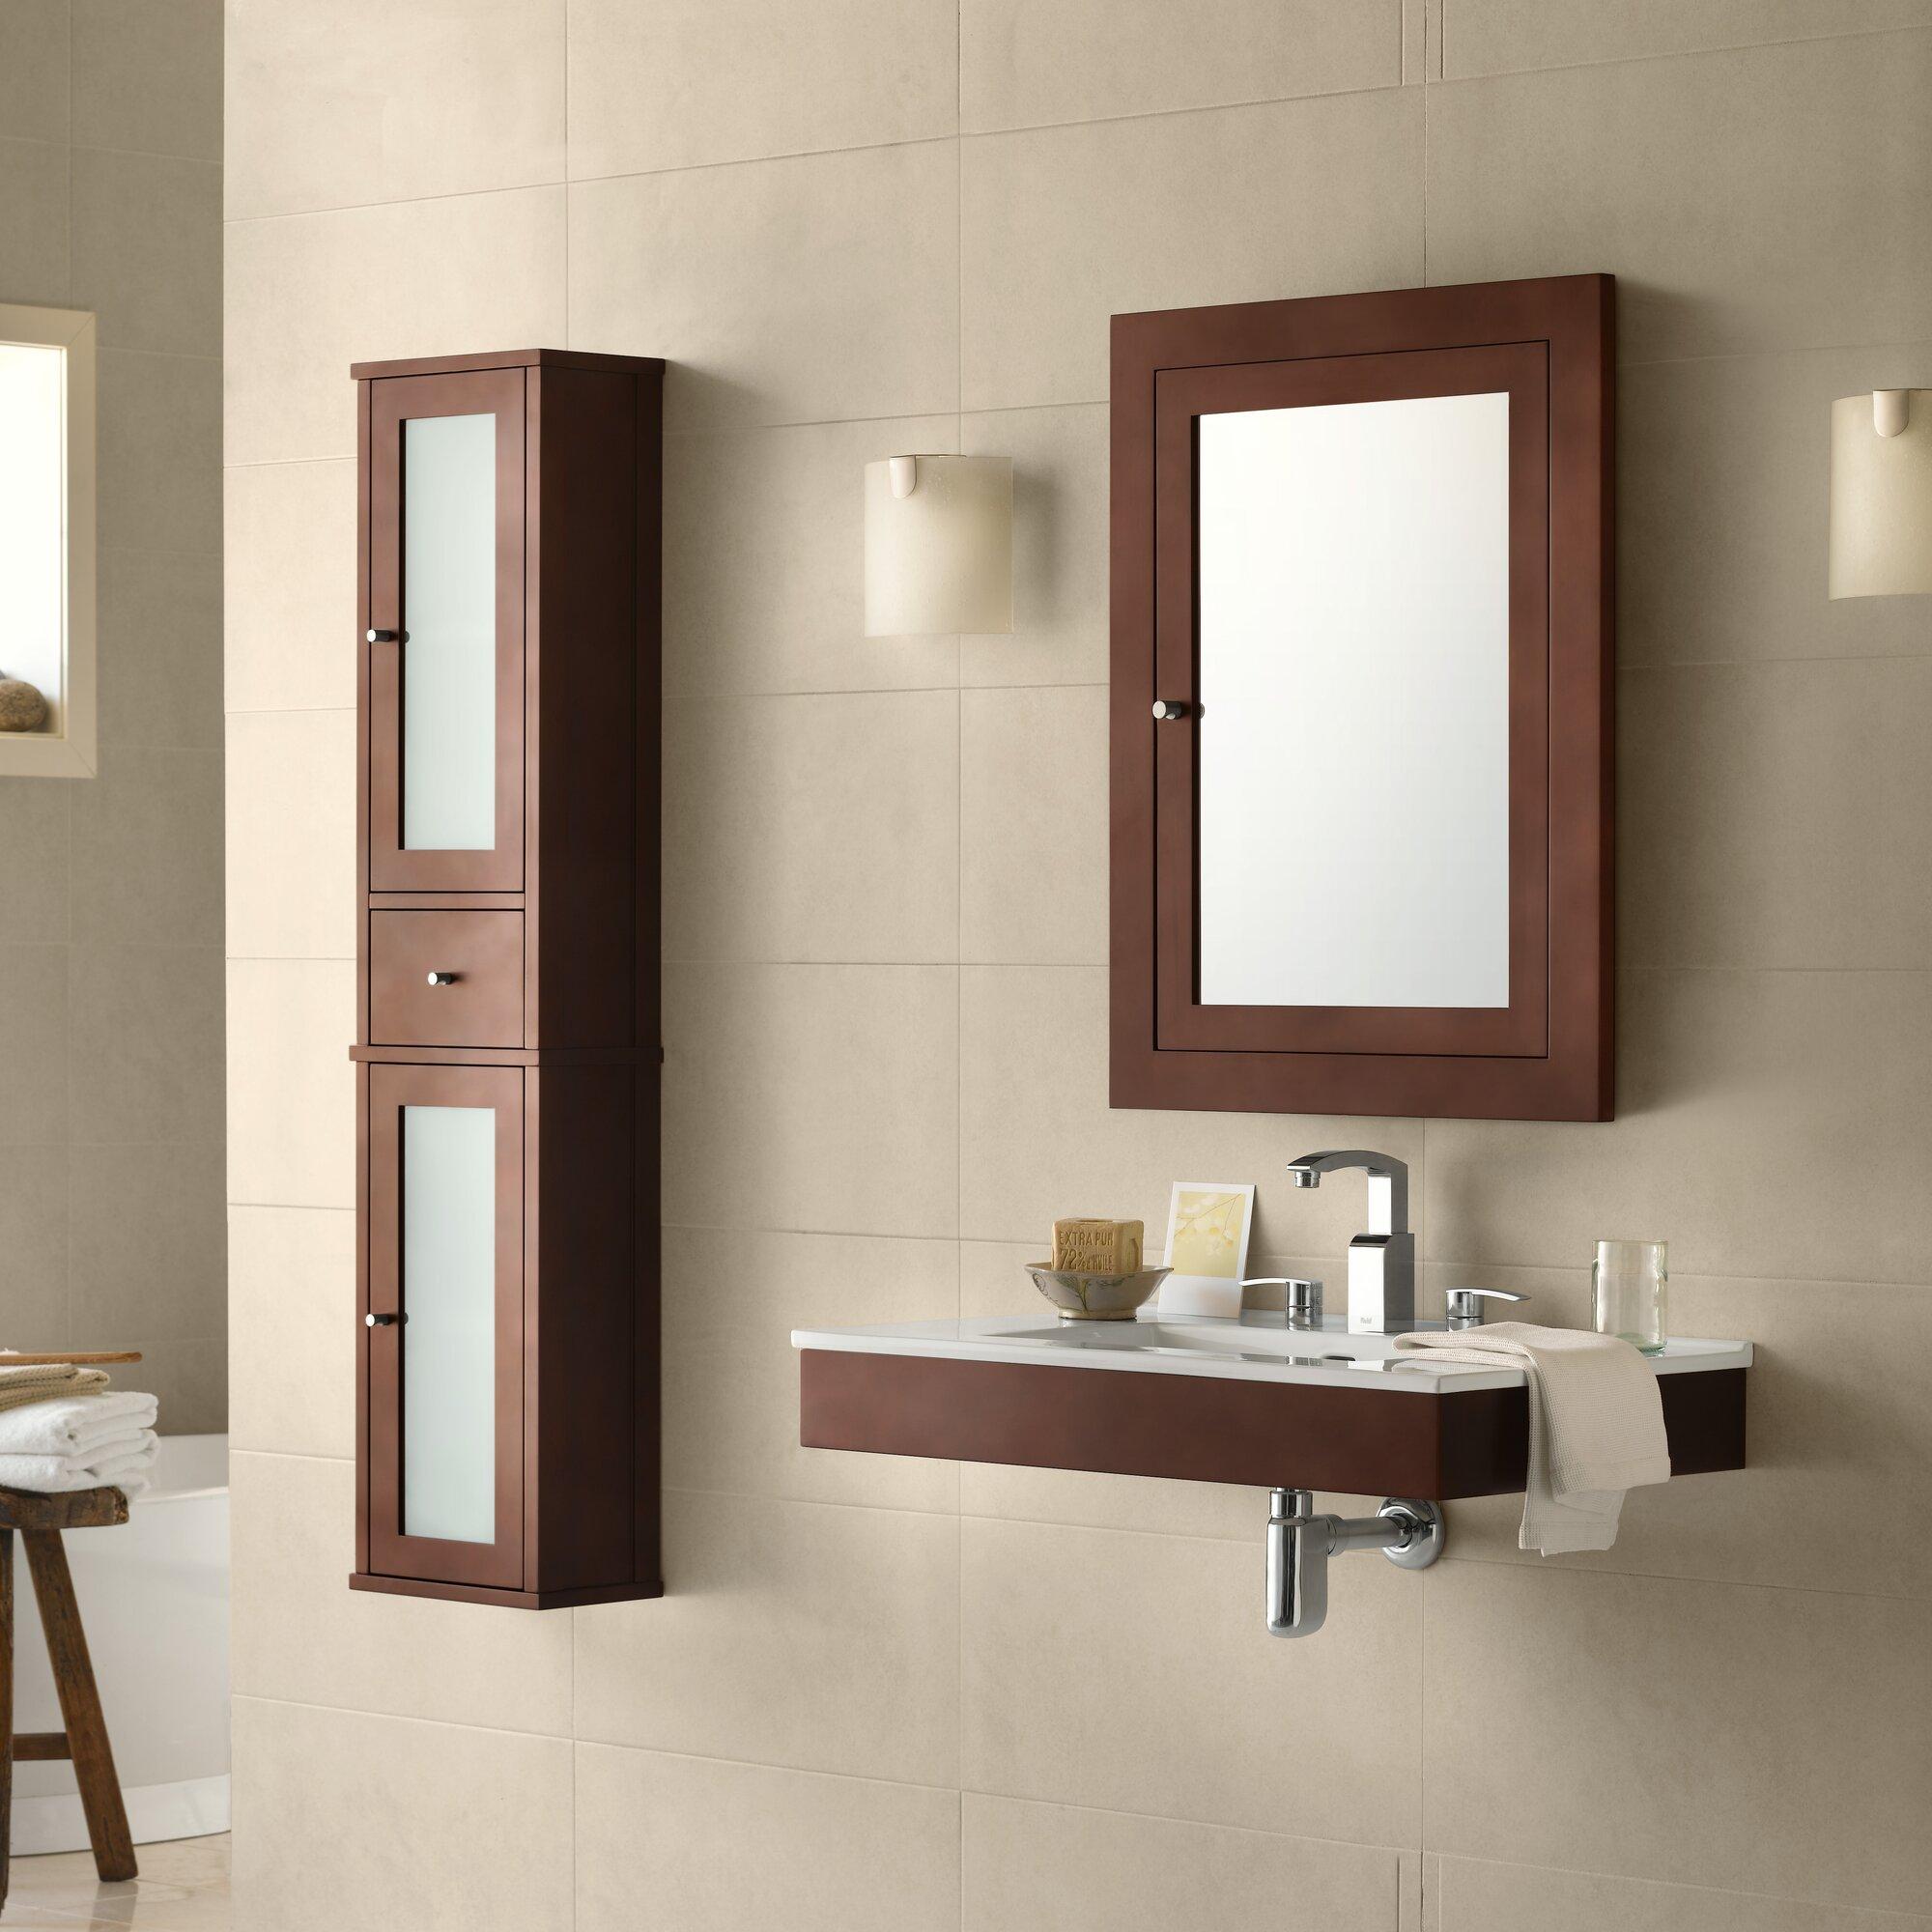 Ronbow adina 31 wall mount bathroom vanity base cabinet in dark cherry for Bathroom wall cabinets cherry